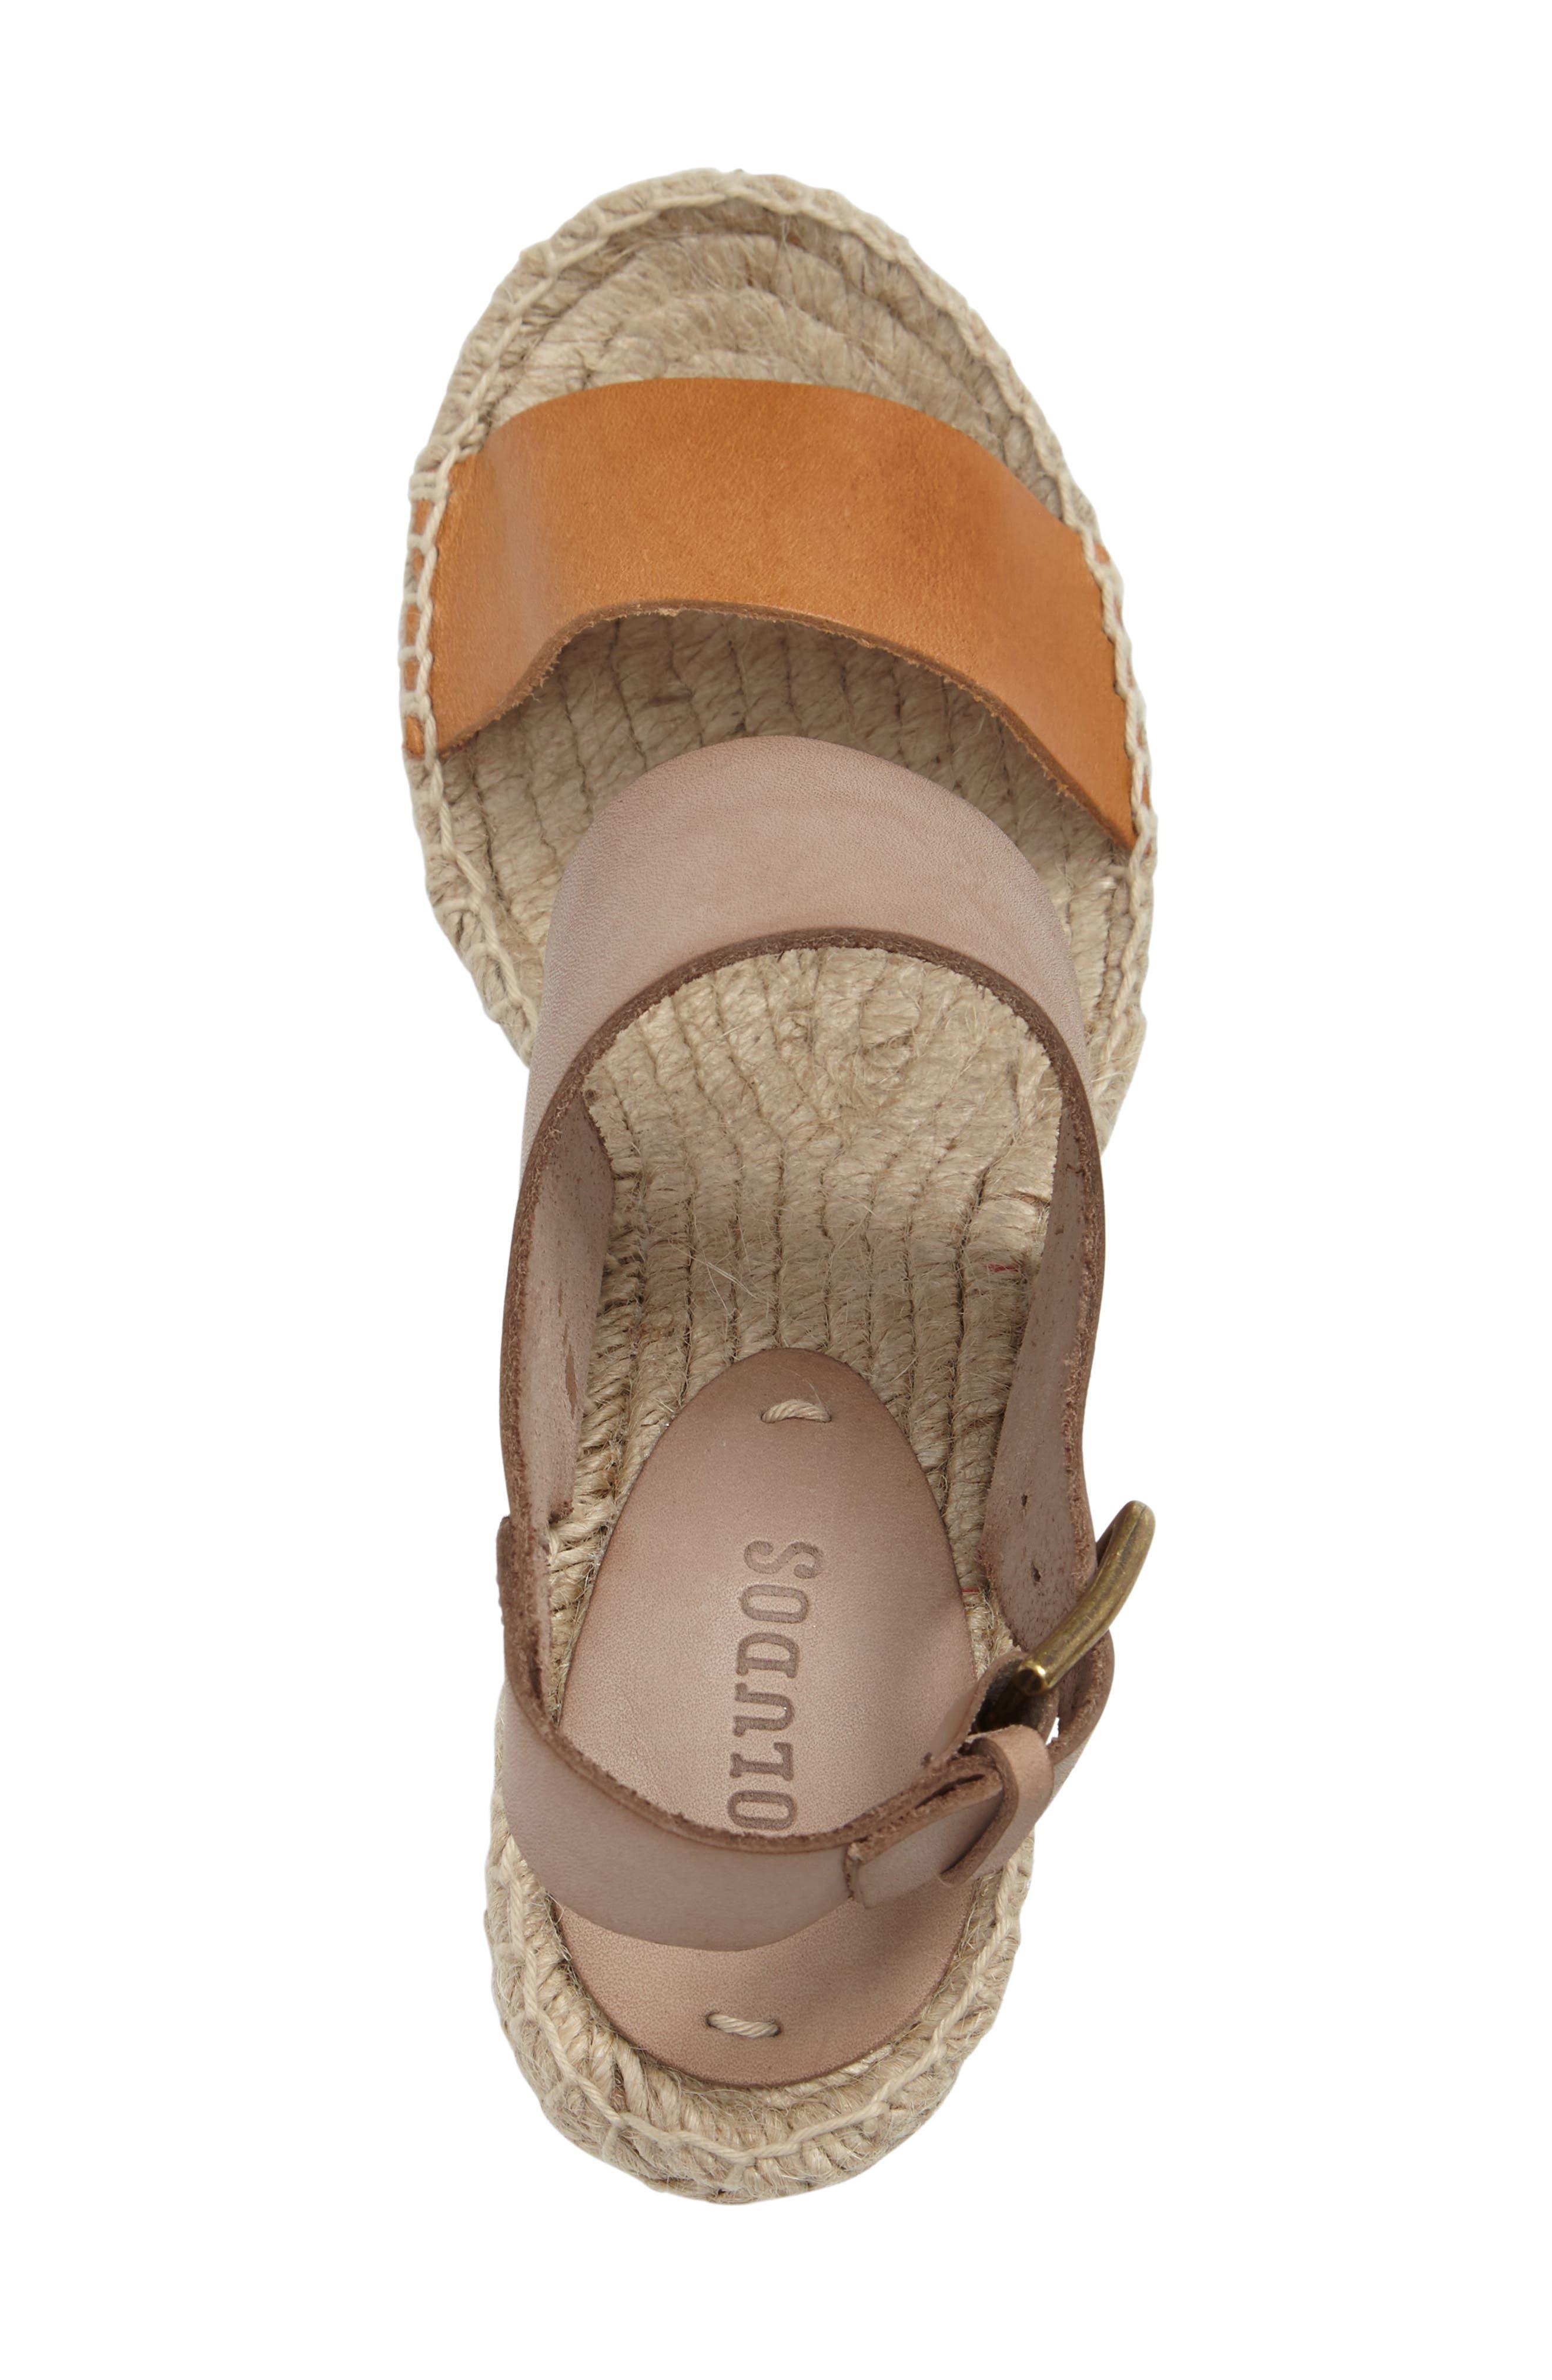 Espadrille Wedge Sandal,                             Alternate thumbnail 3, color,                             022